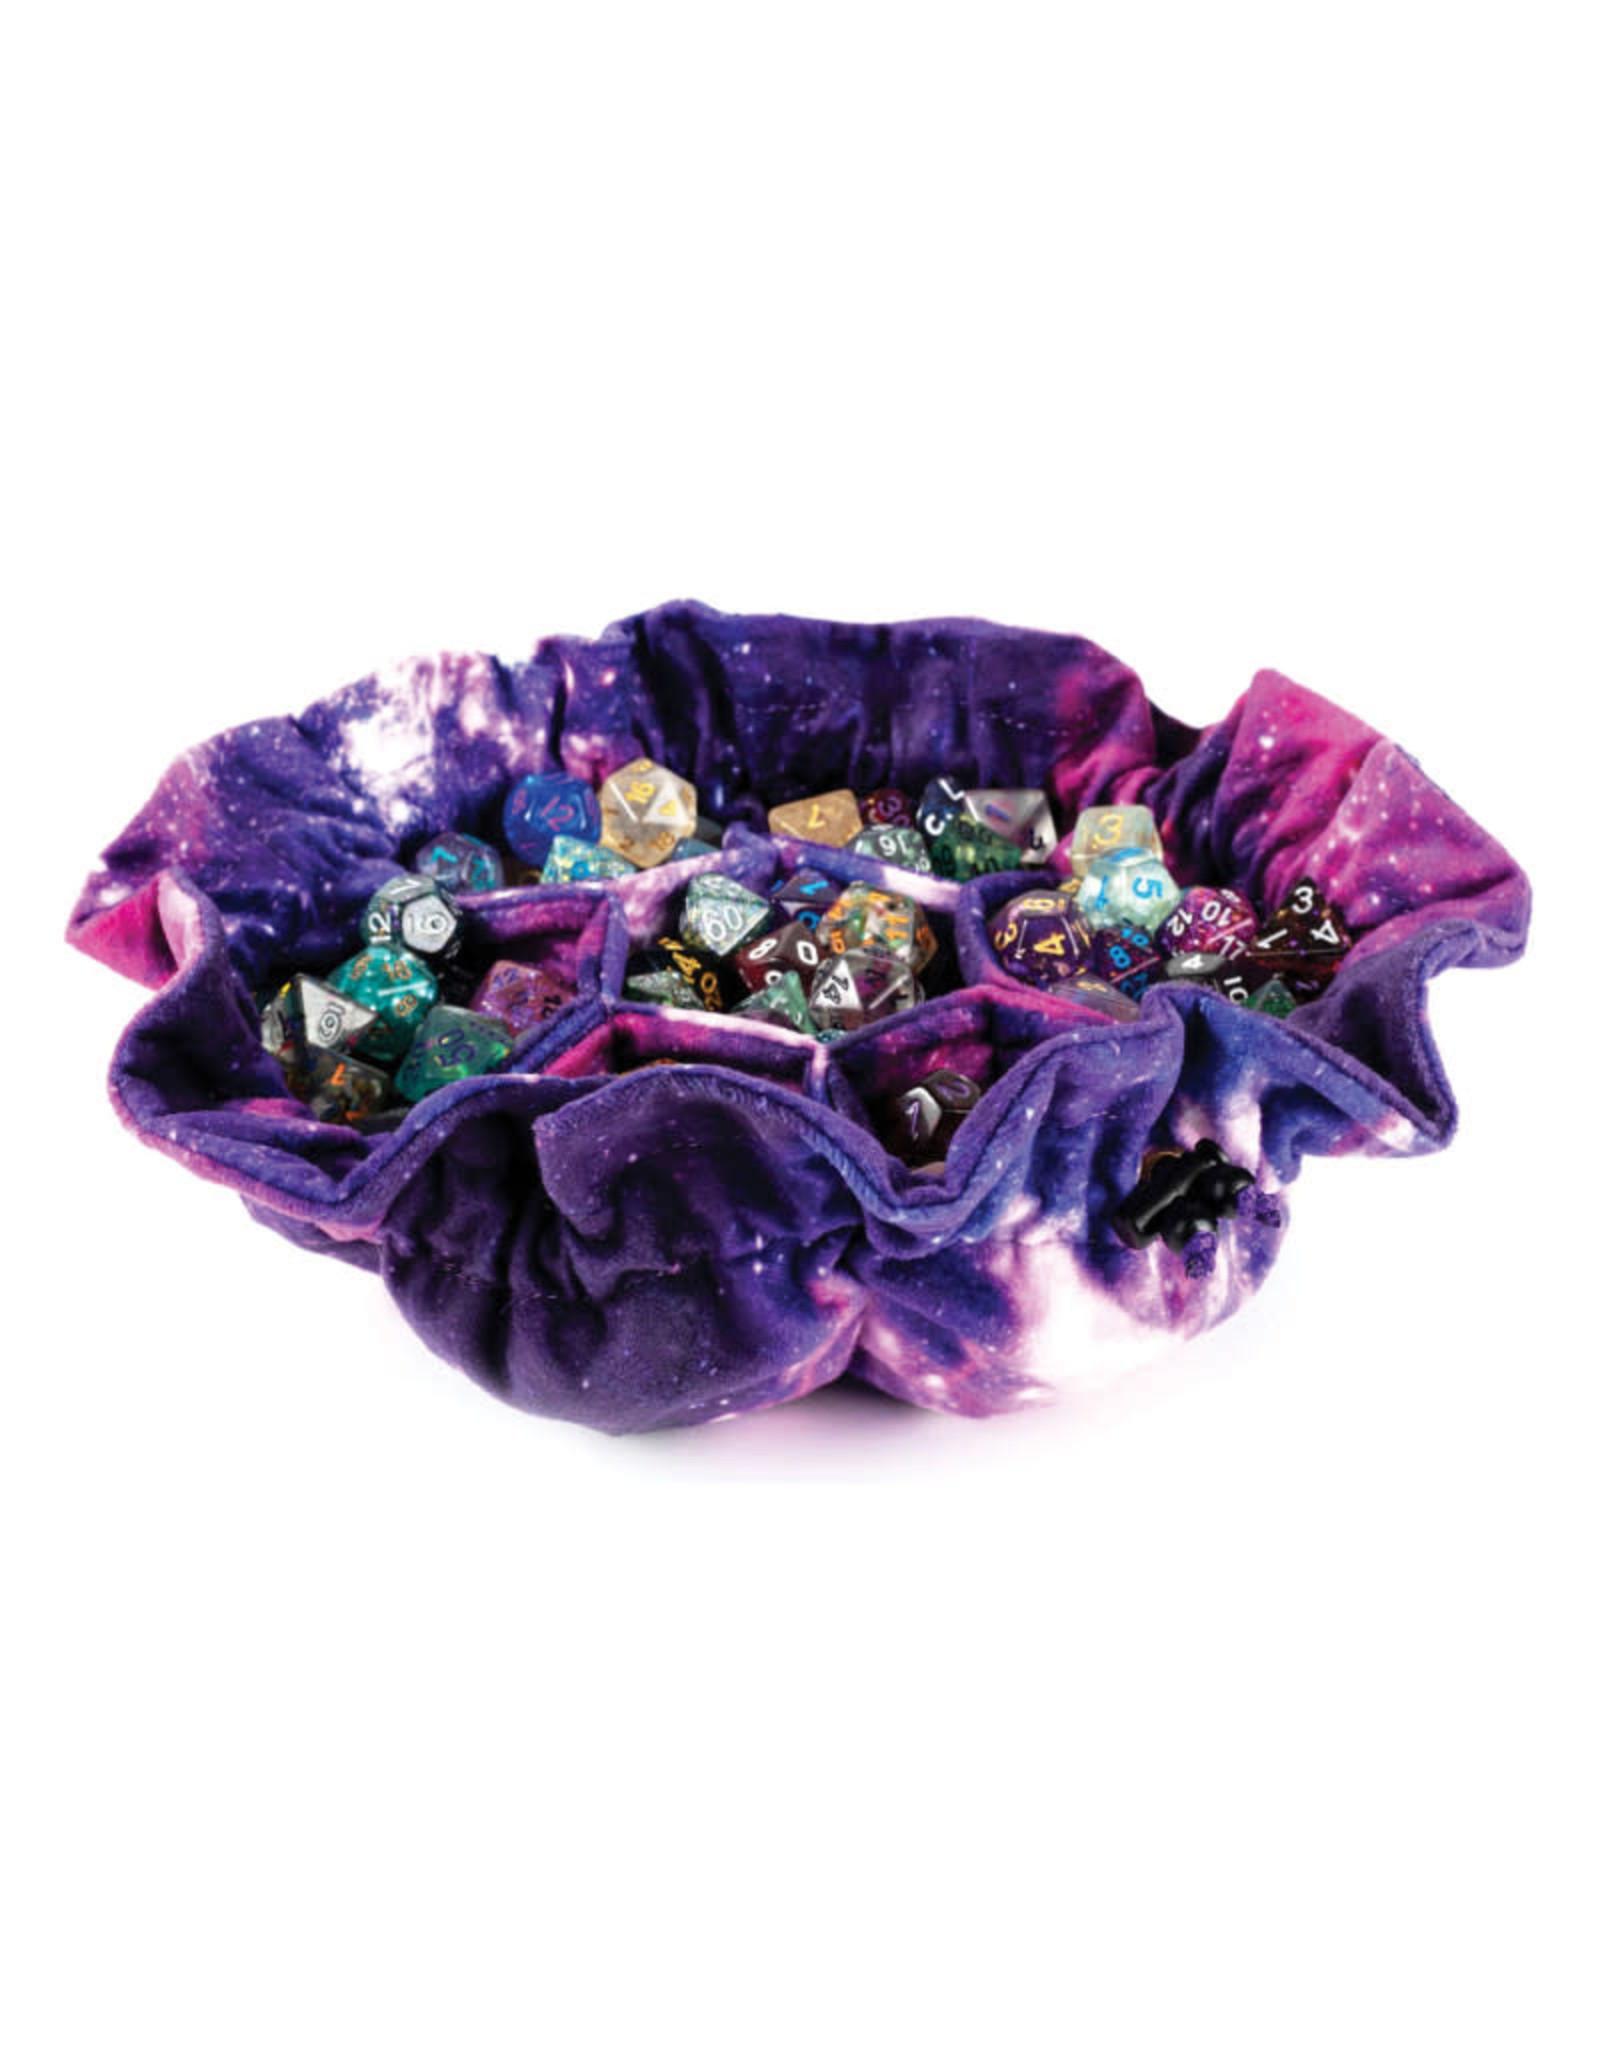 Metallic Dice Games Dice Bag: Velvet Compartment with Pockets: Nebula